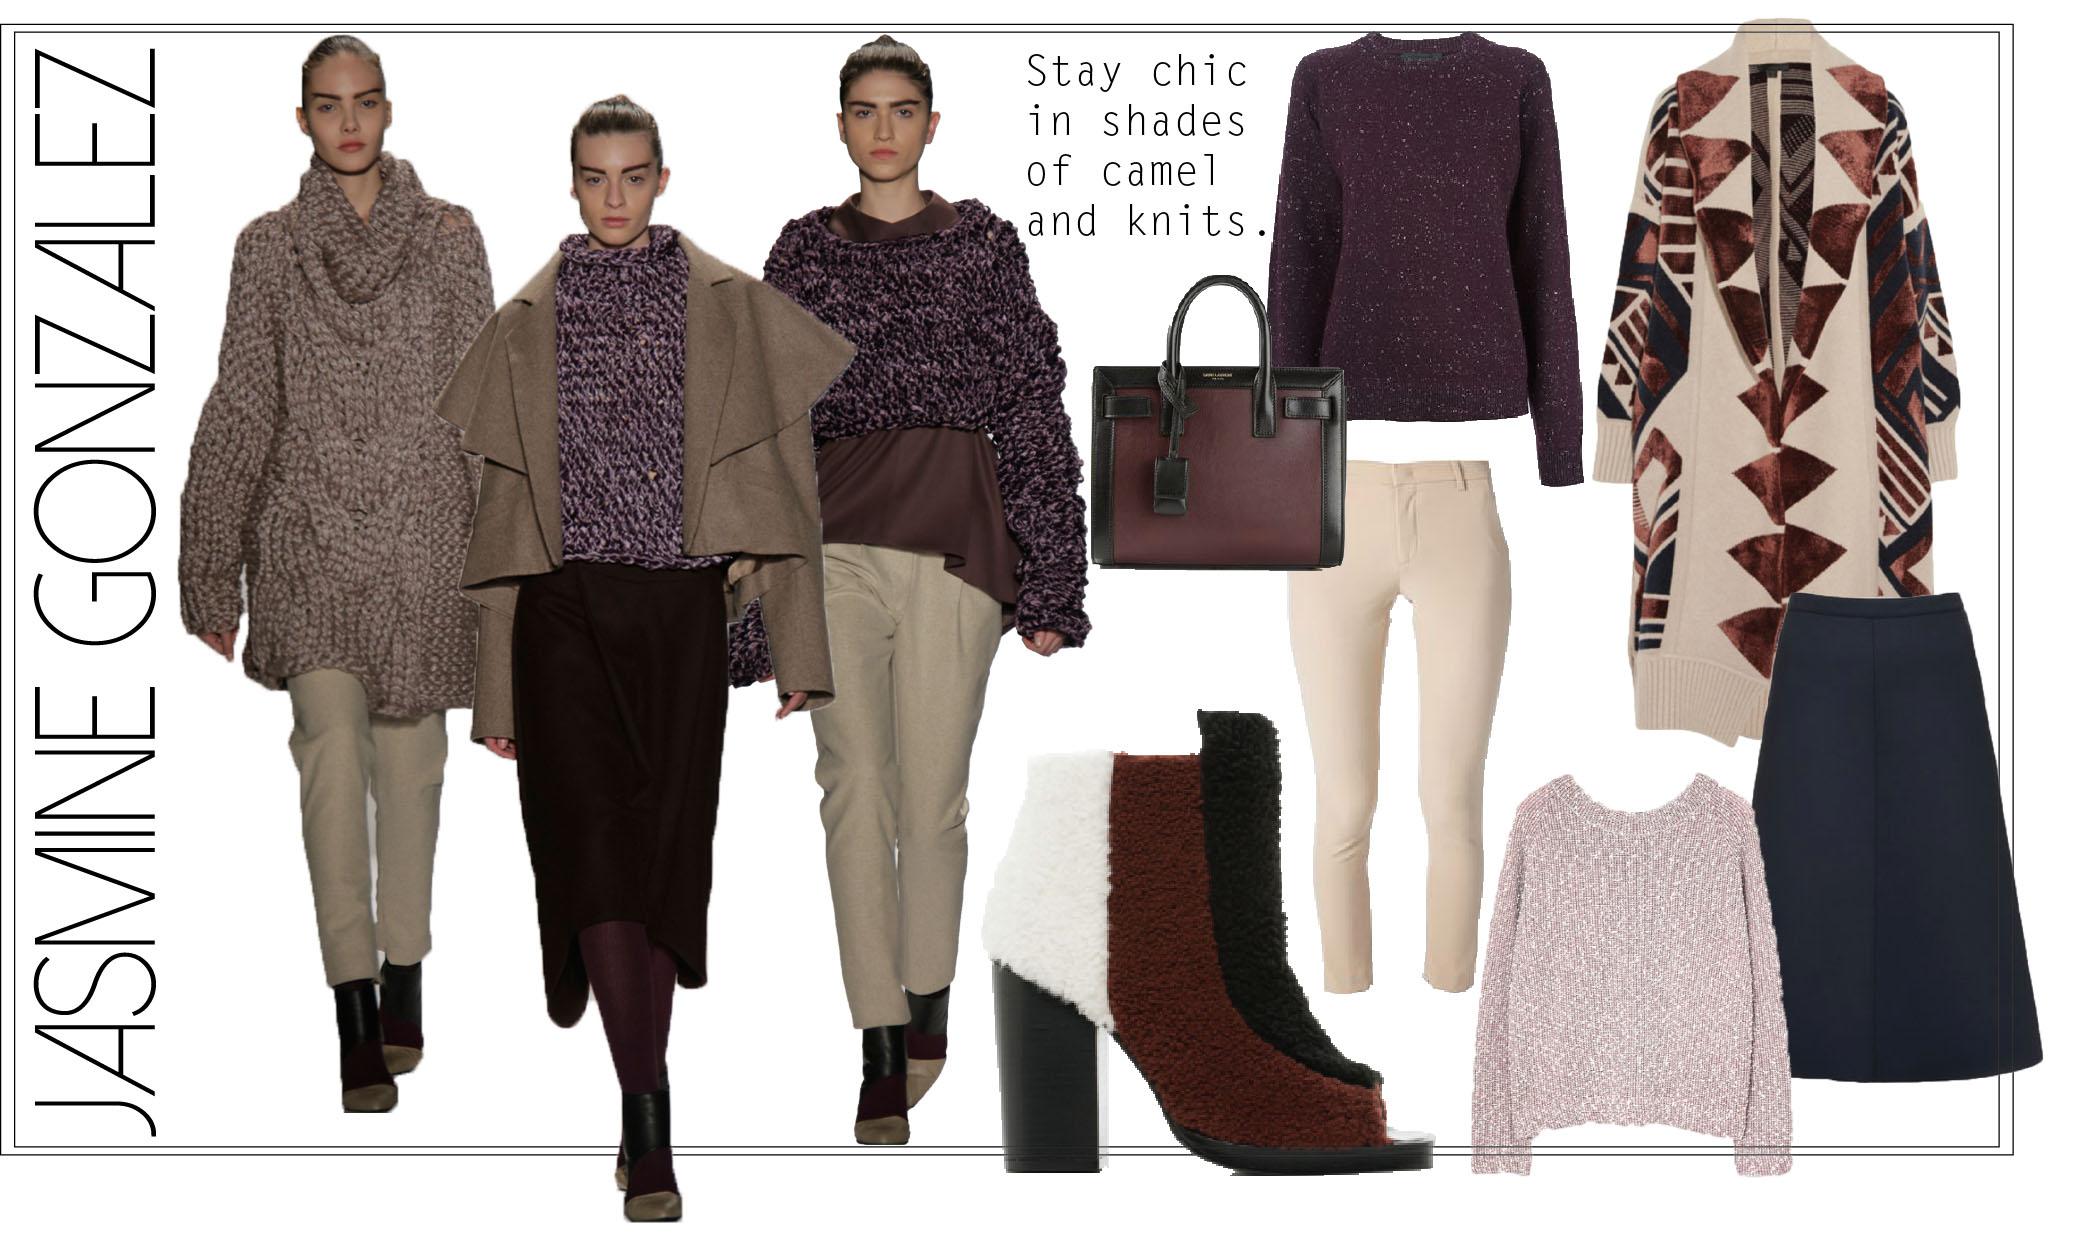 Runway designs by Jasmine Gonzalez, MFA Fashion and Knitwear Design